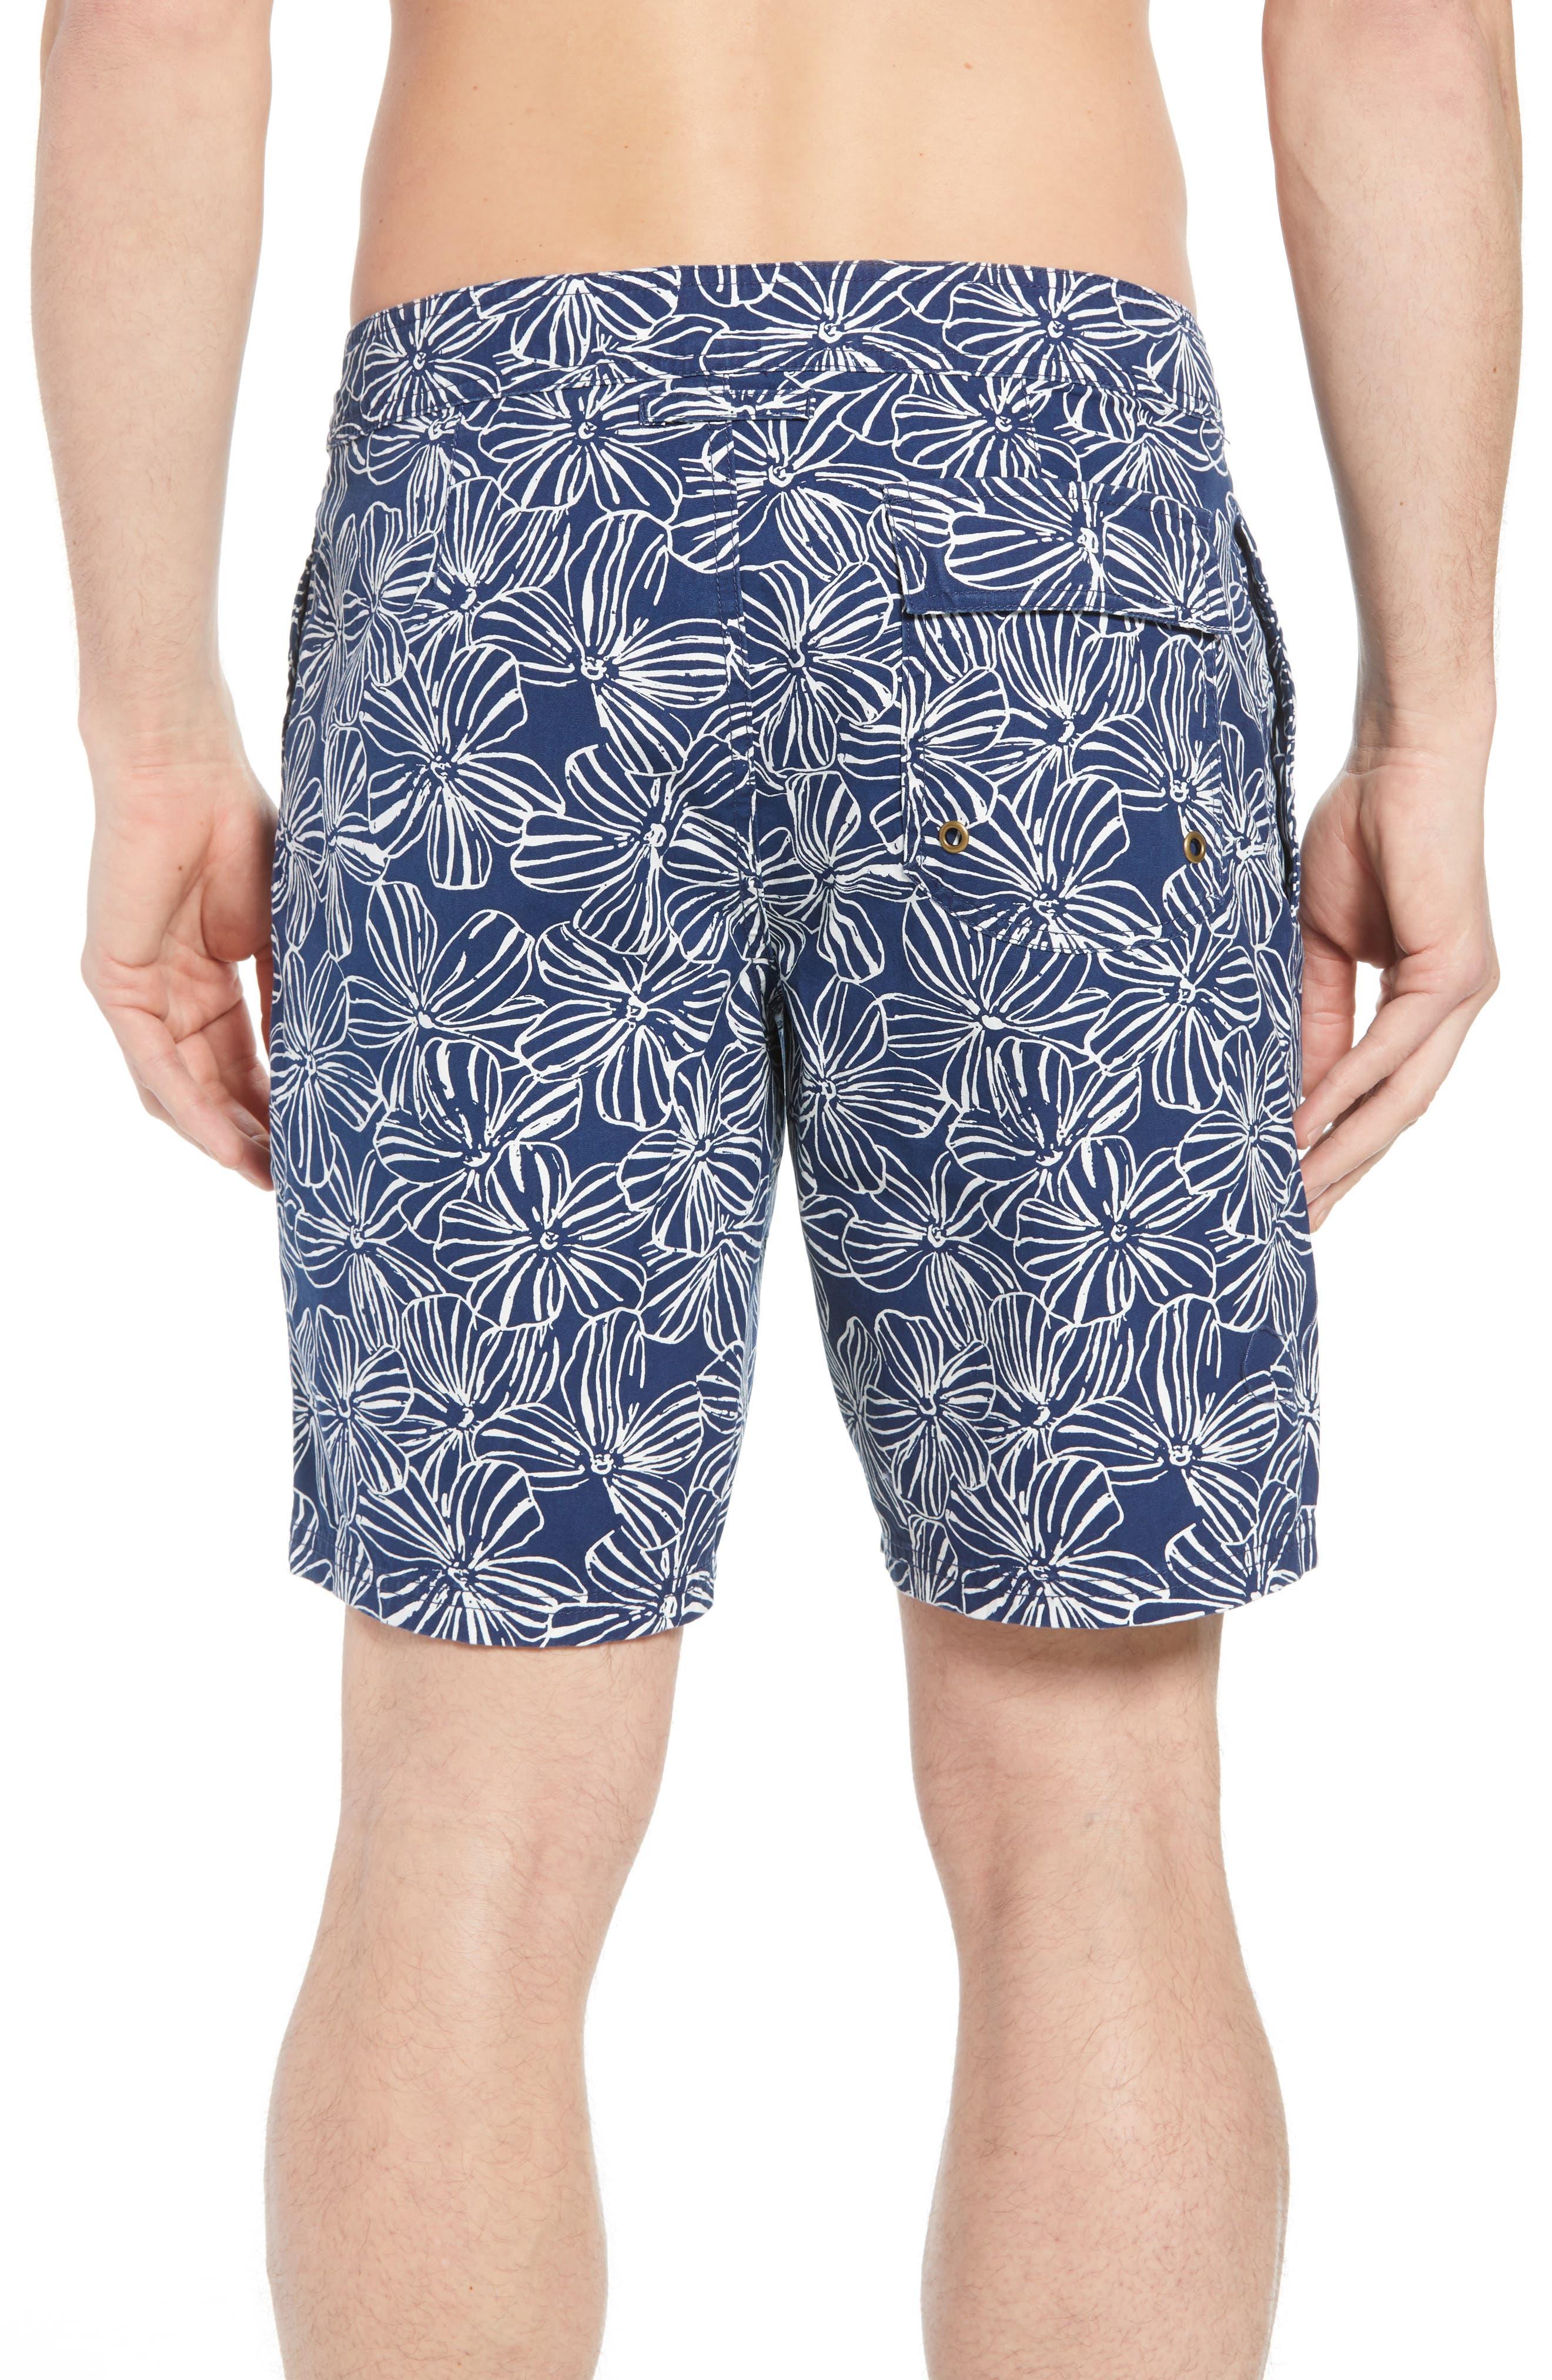 Mala Melia Regular Fit Board Shorts,                             Alternate thumbnail 2, color,                             BLUE